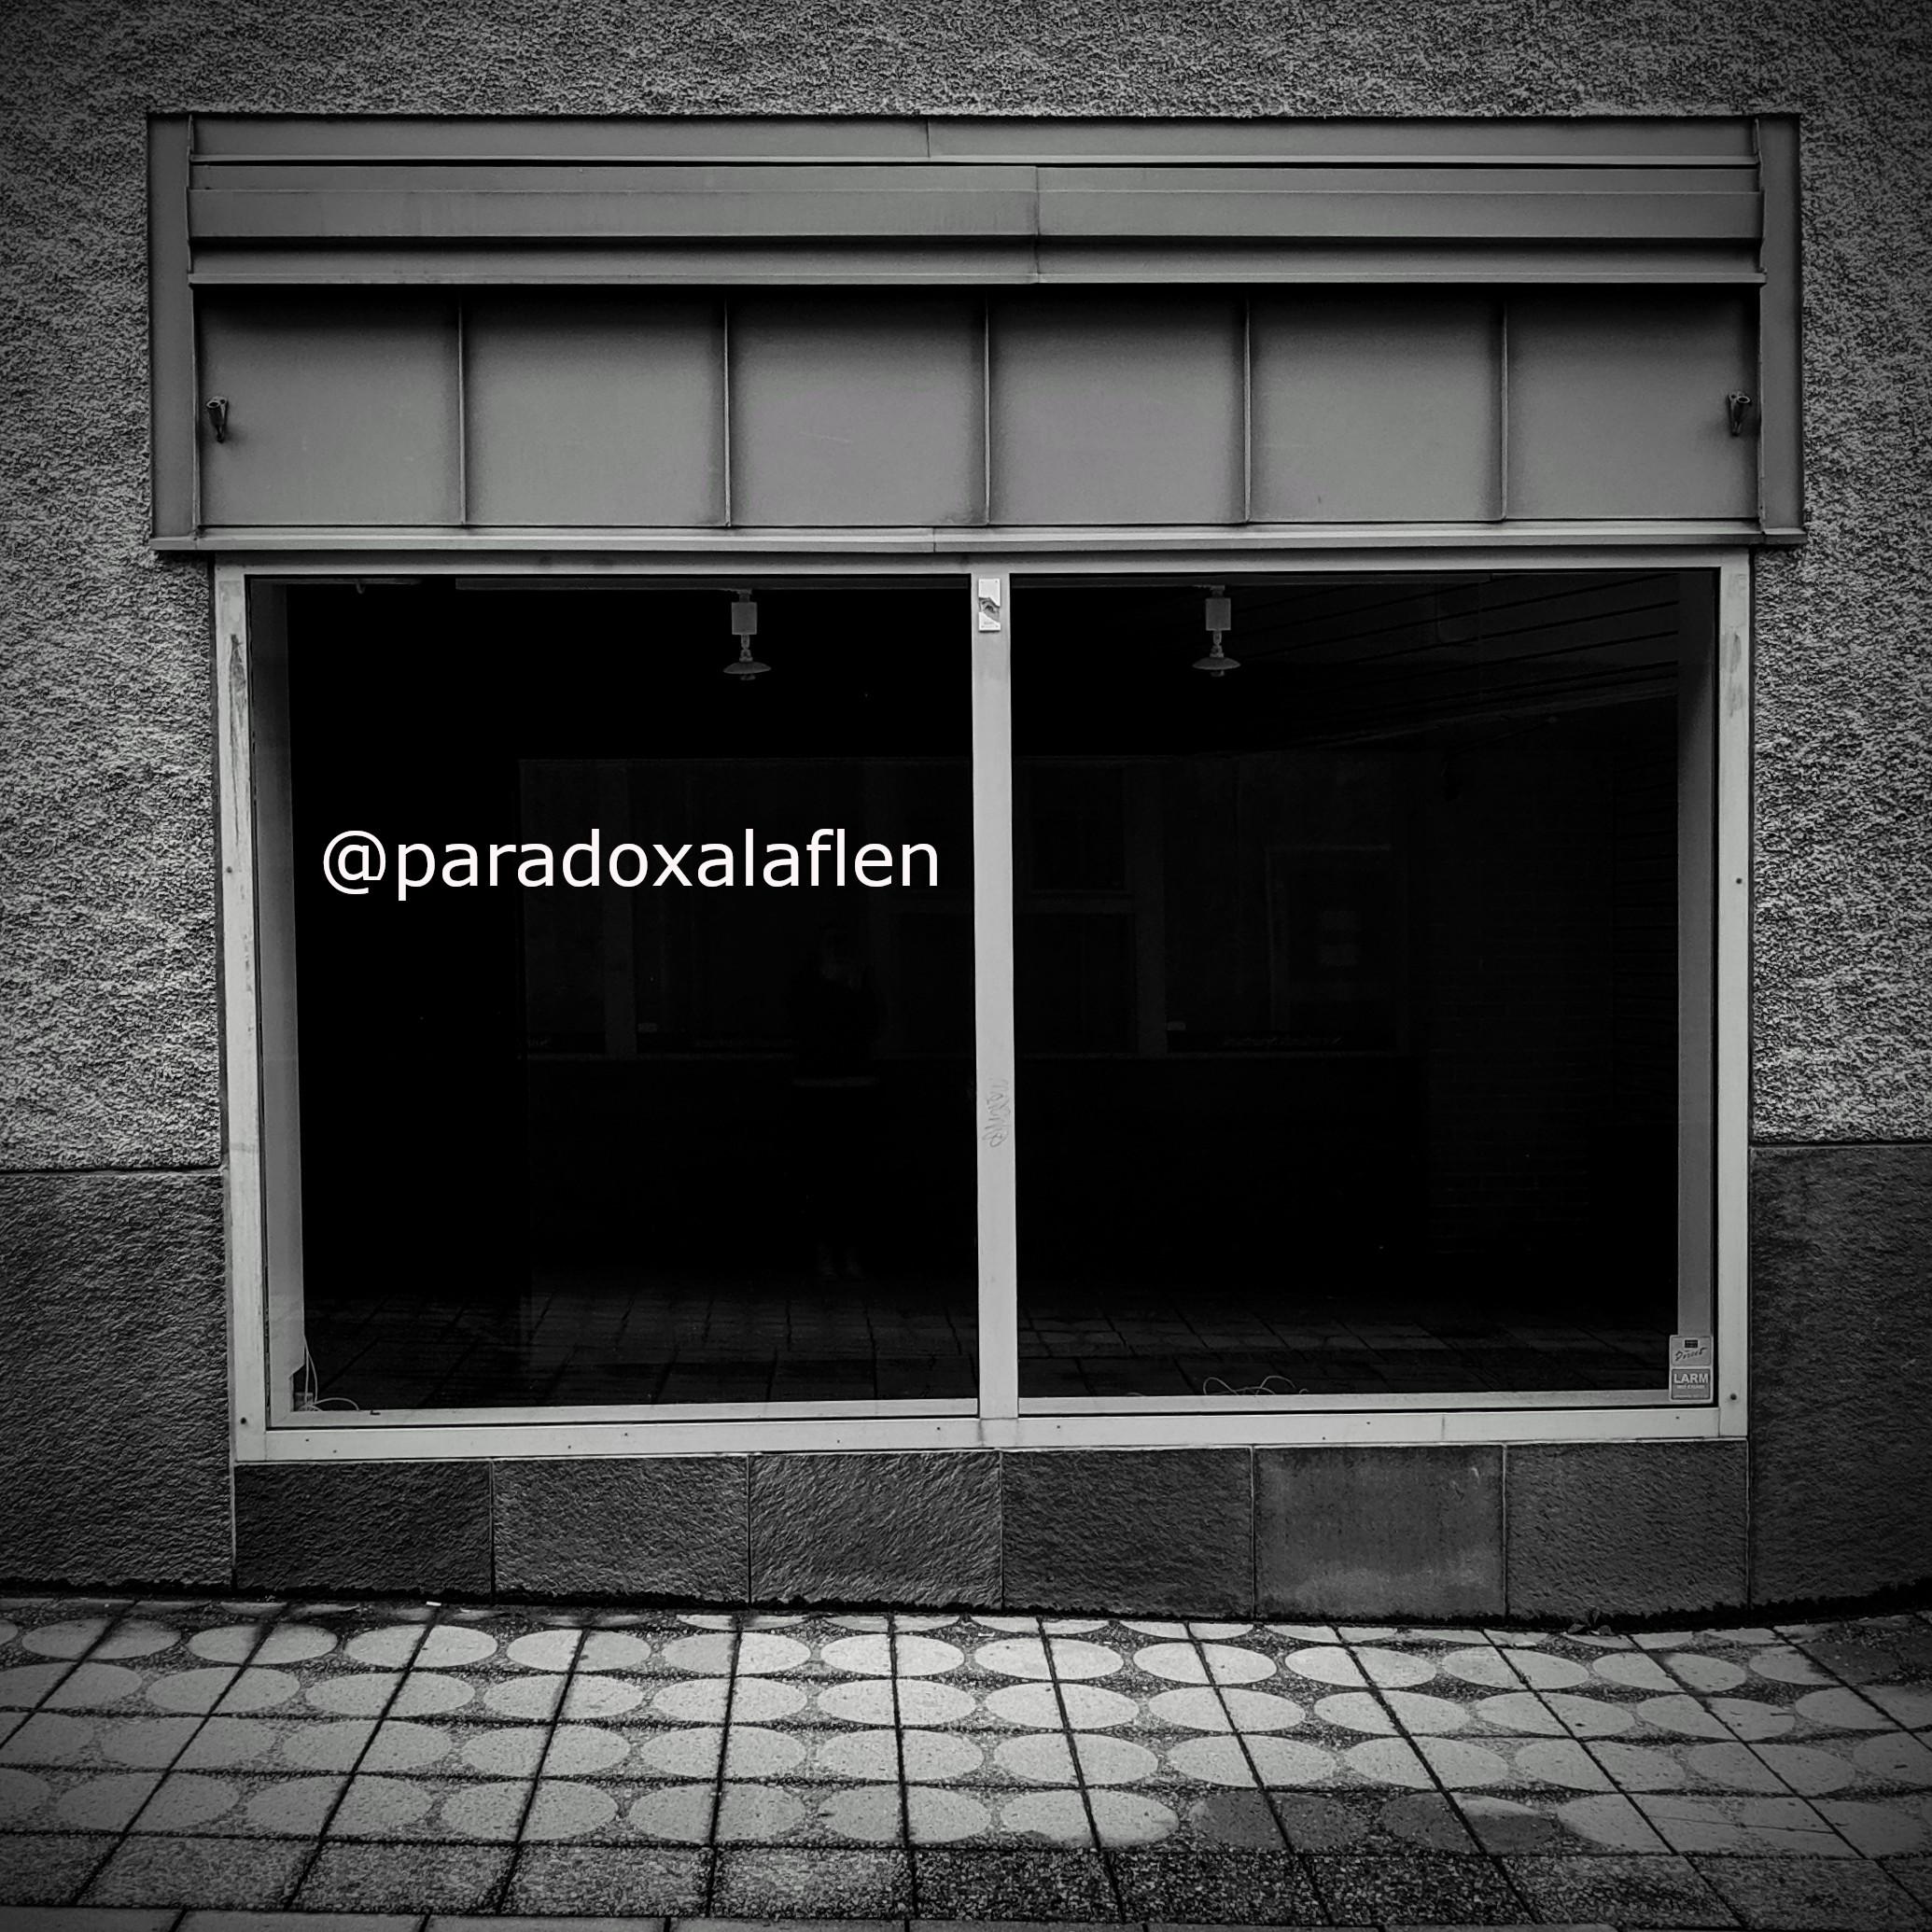 Paradoxala Flen